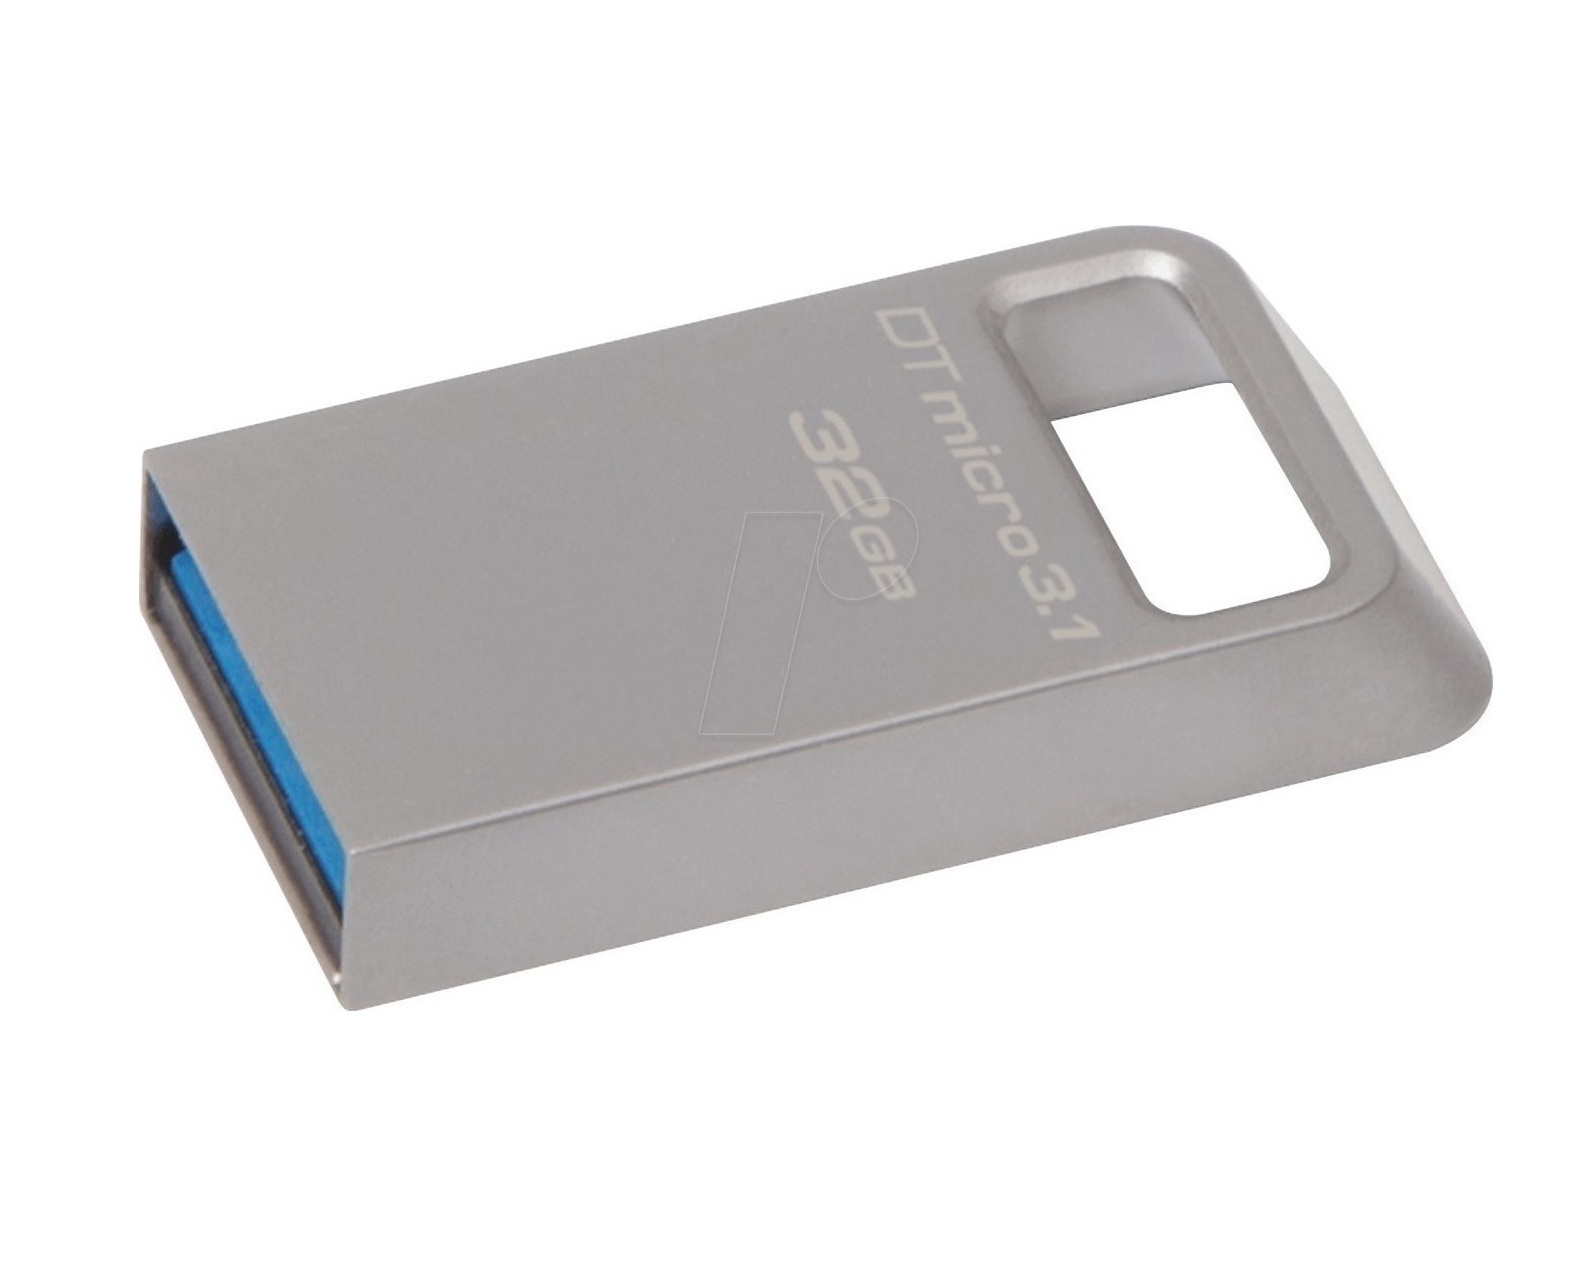 Kingston Datatraveler Micro 32GB USB 3.1 Flash Drive